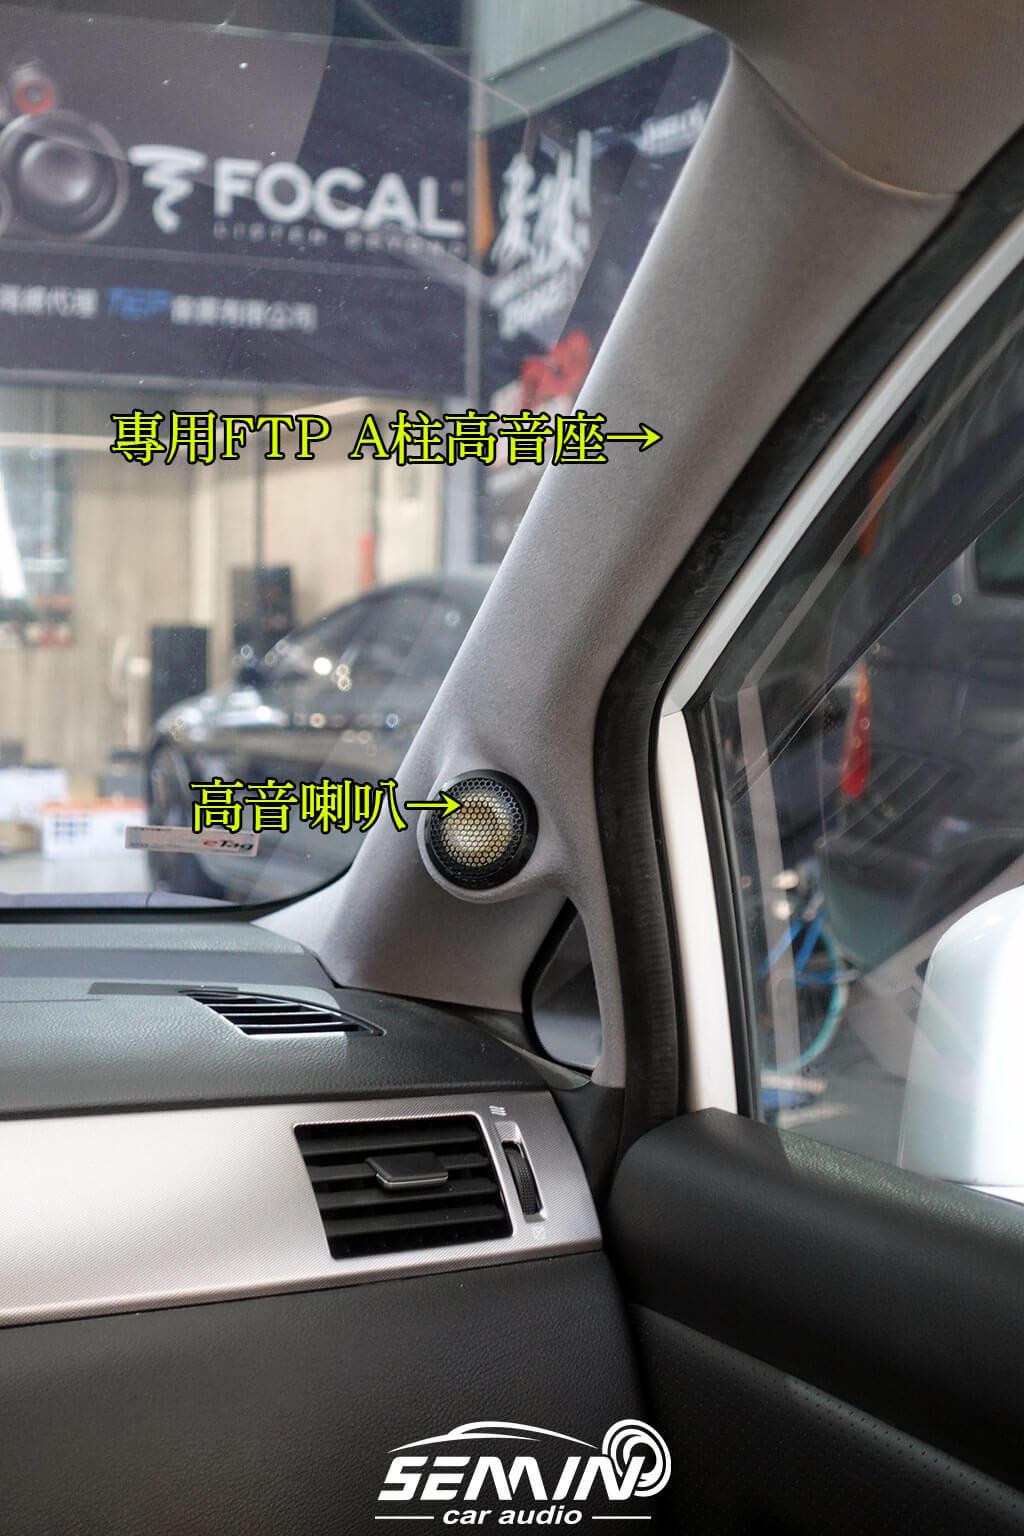 2019 IASCA TAIWAN車用音響爭霸賽 挑戰C組(2500USD以下)